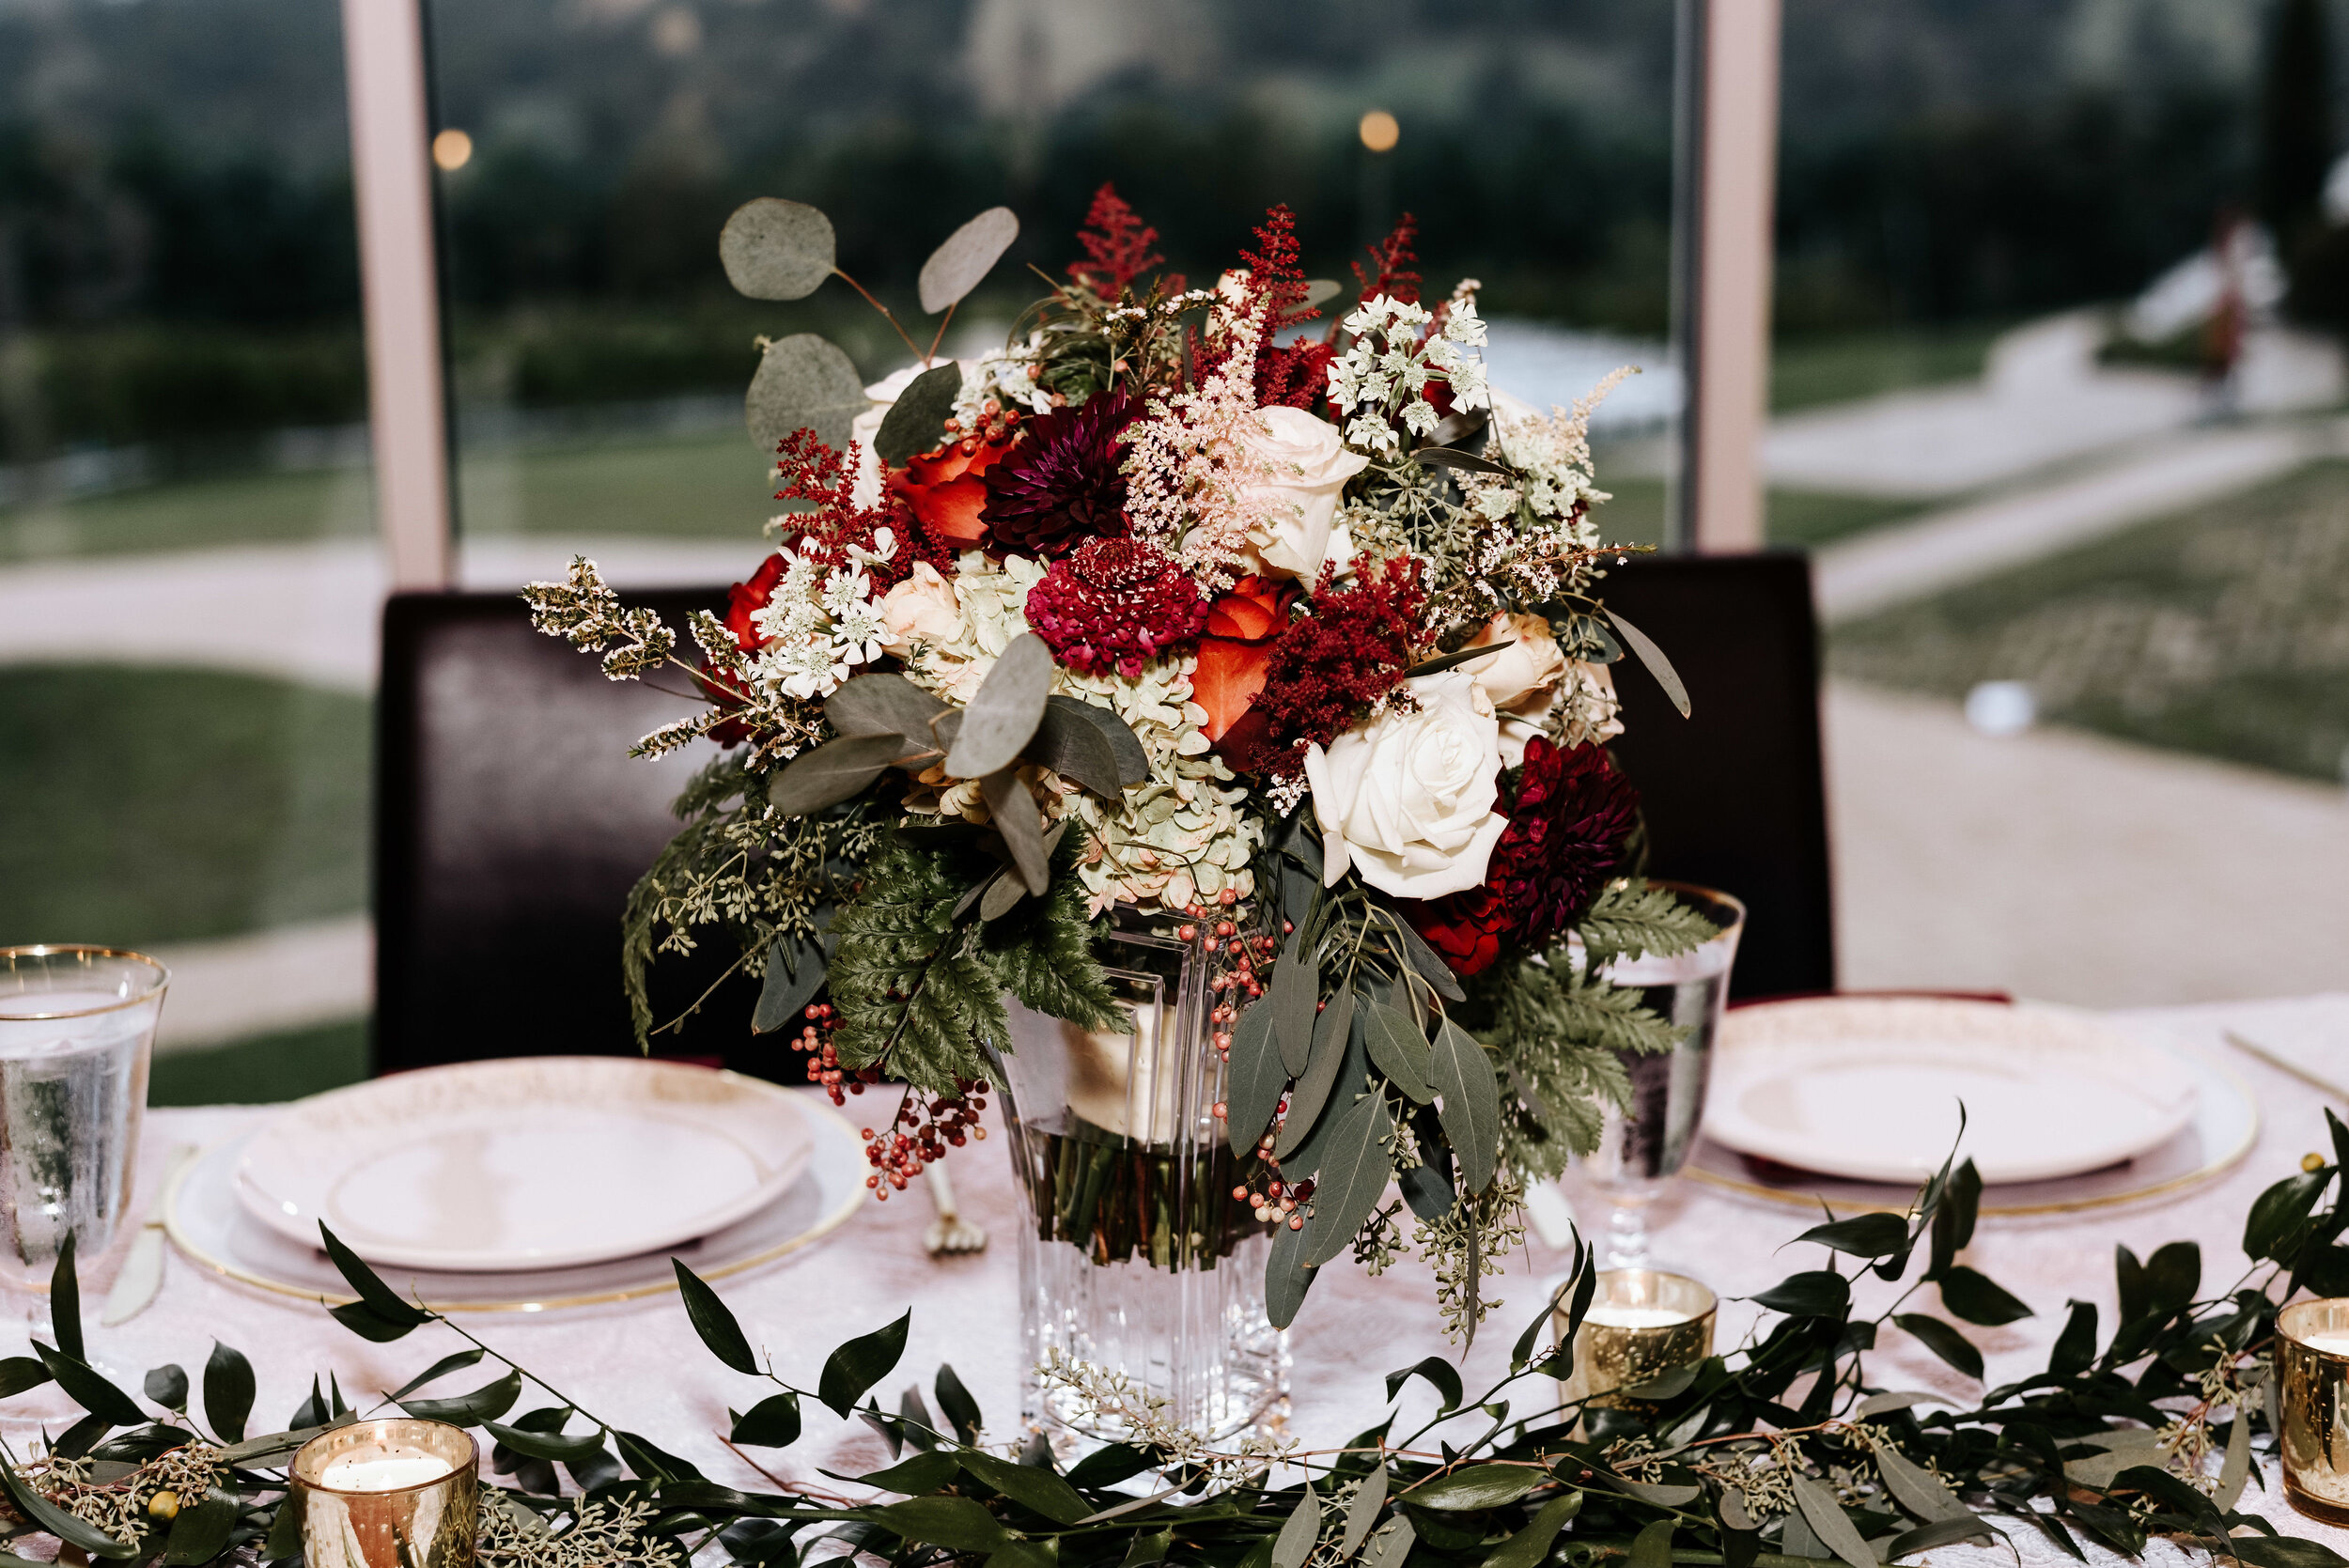 Allison_Nolan_Moss_Vineyards_Wedding_Charlottesville_Virginia_Photography_by_V_67.jpg